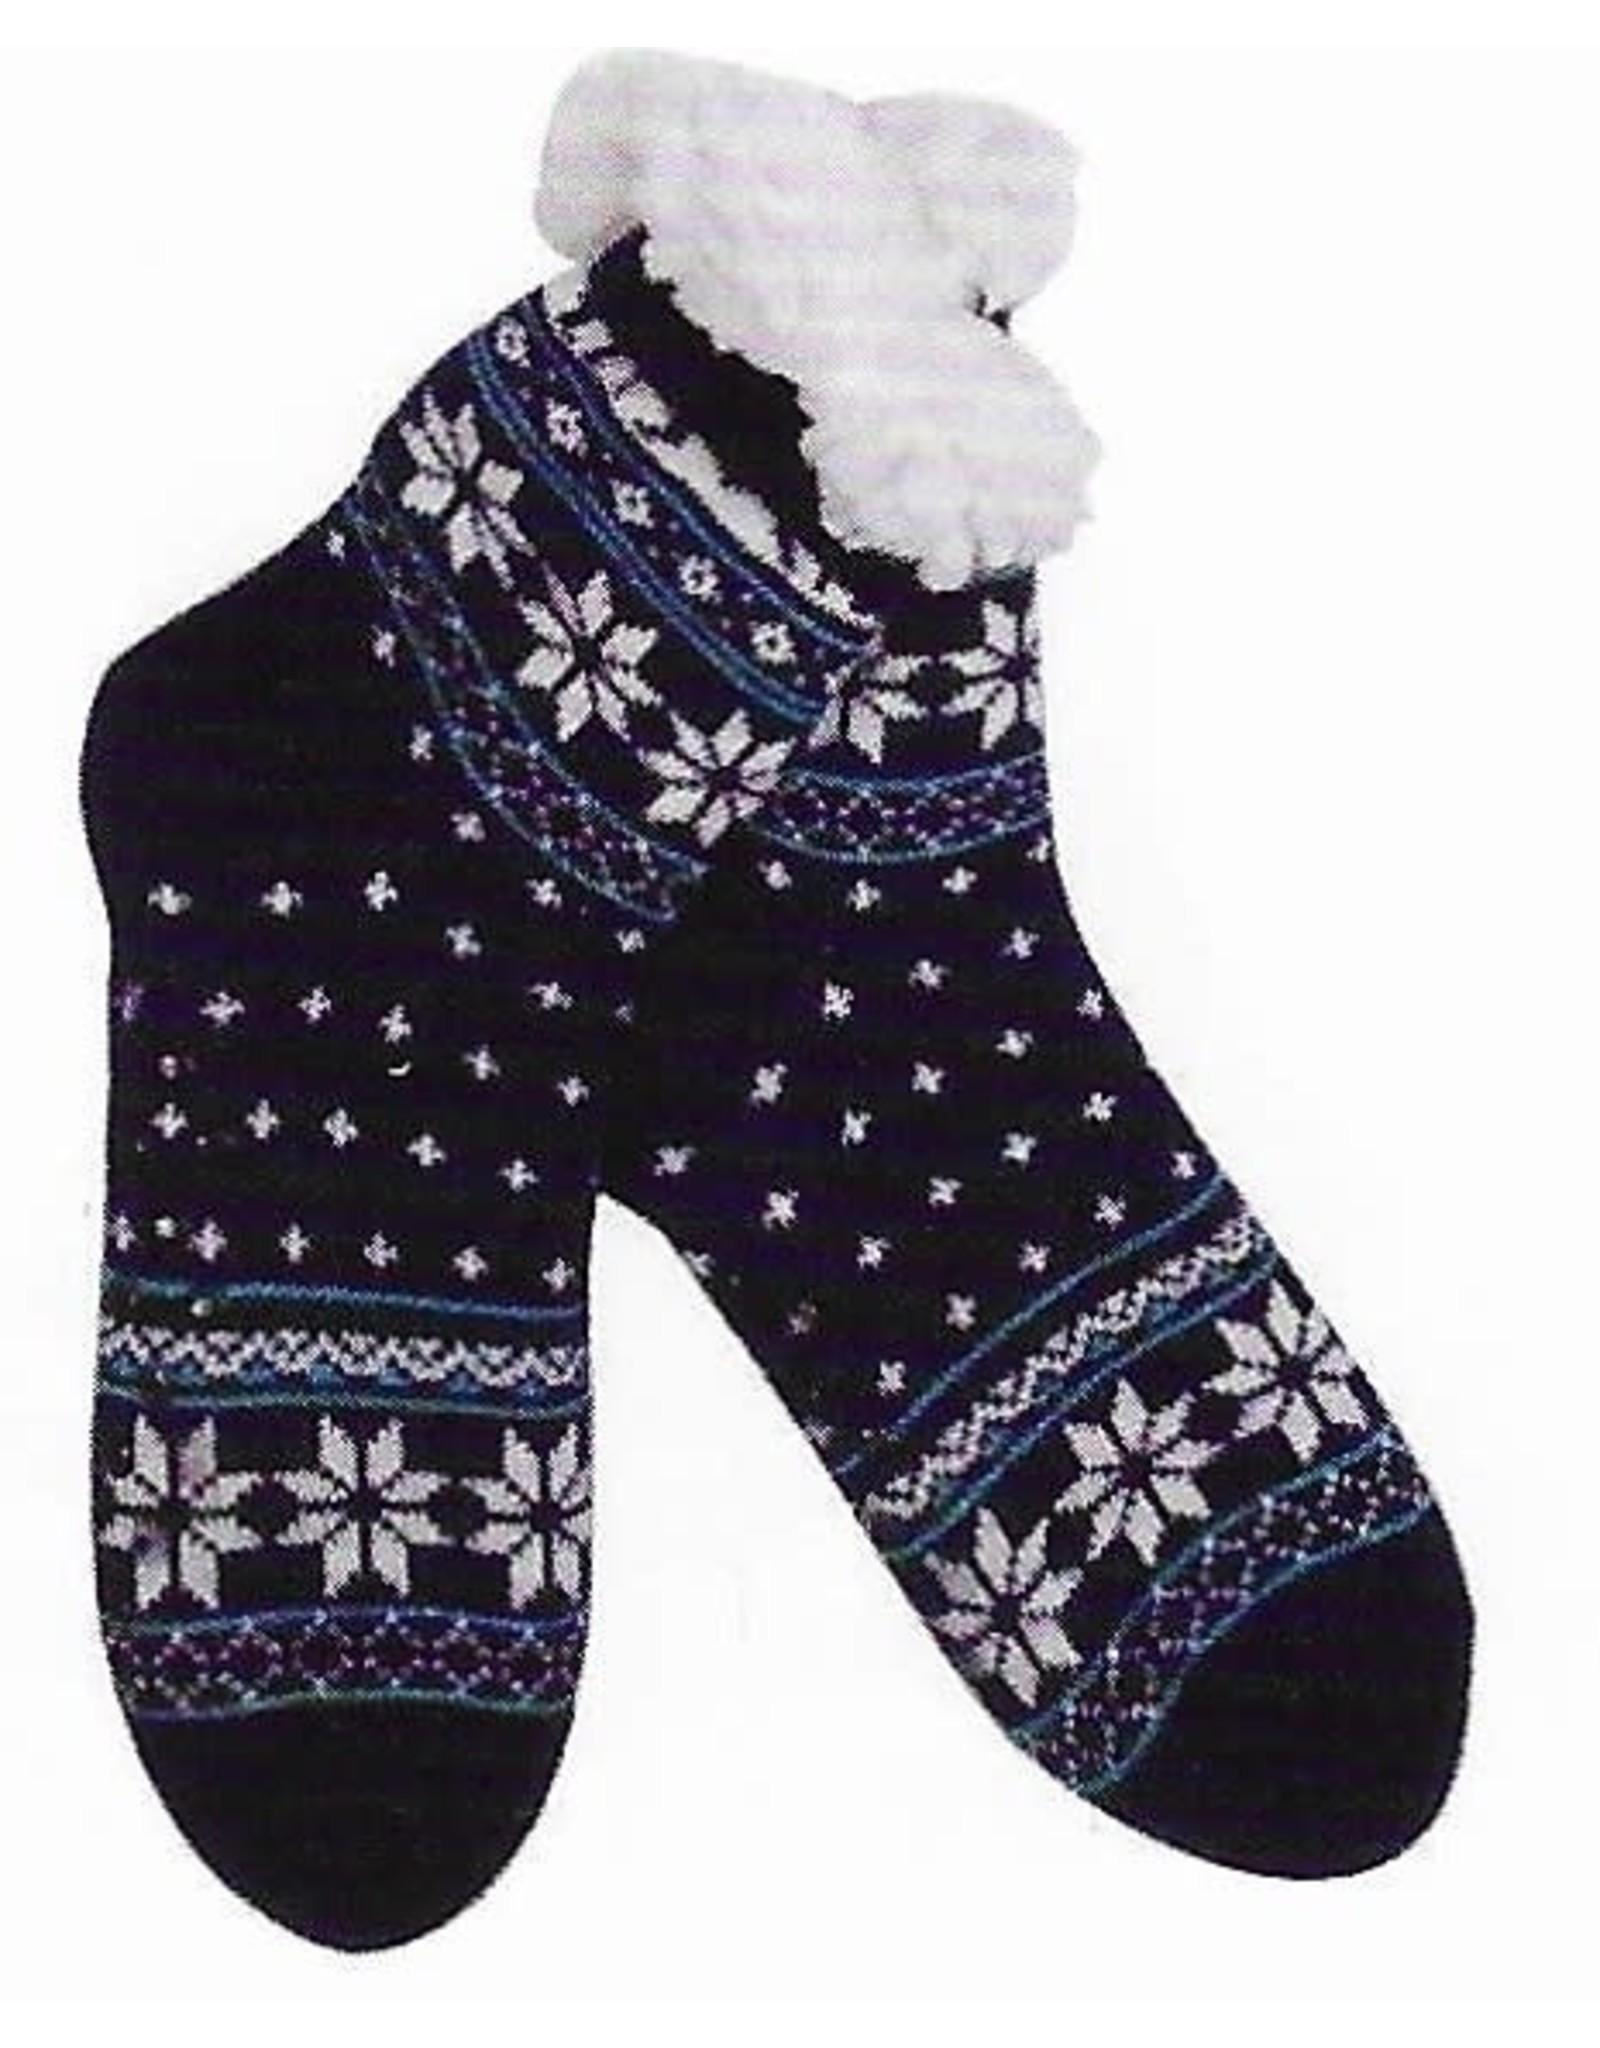 Lietho winter stockings (black/blue/white) - 39-42